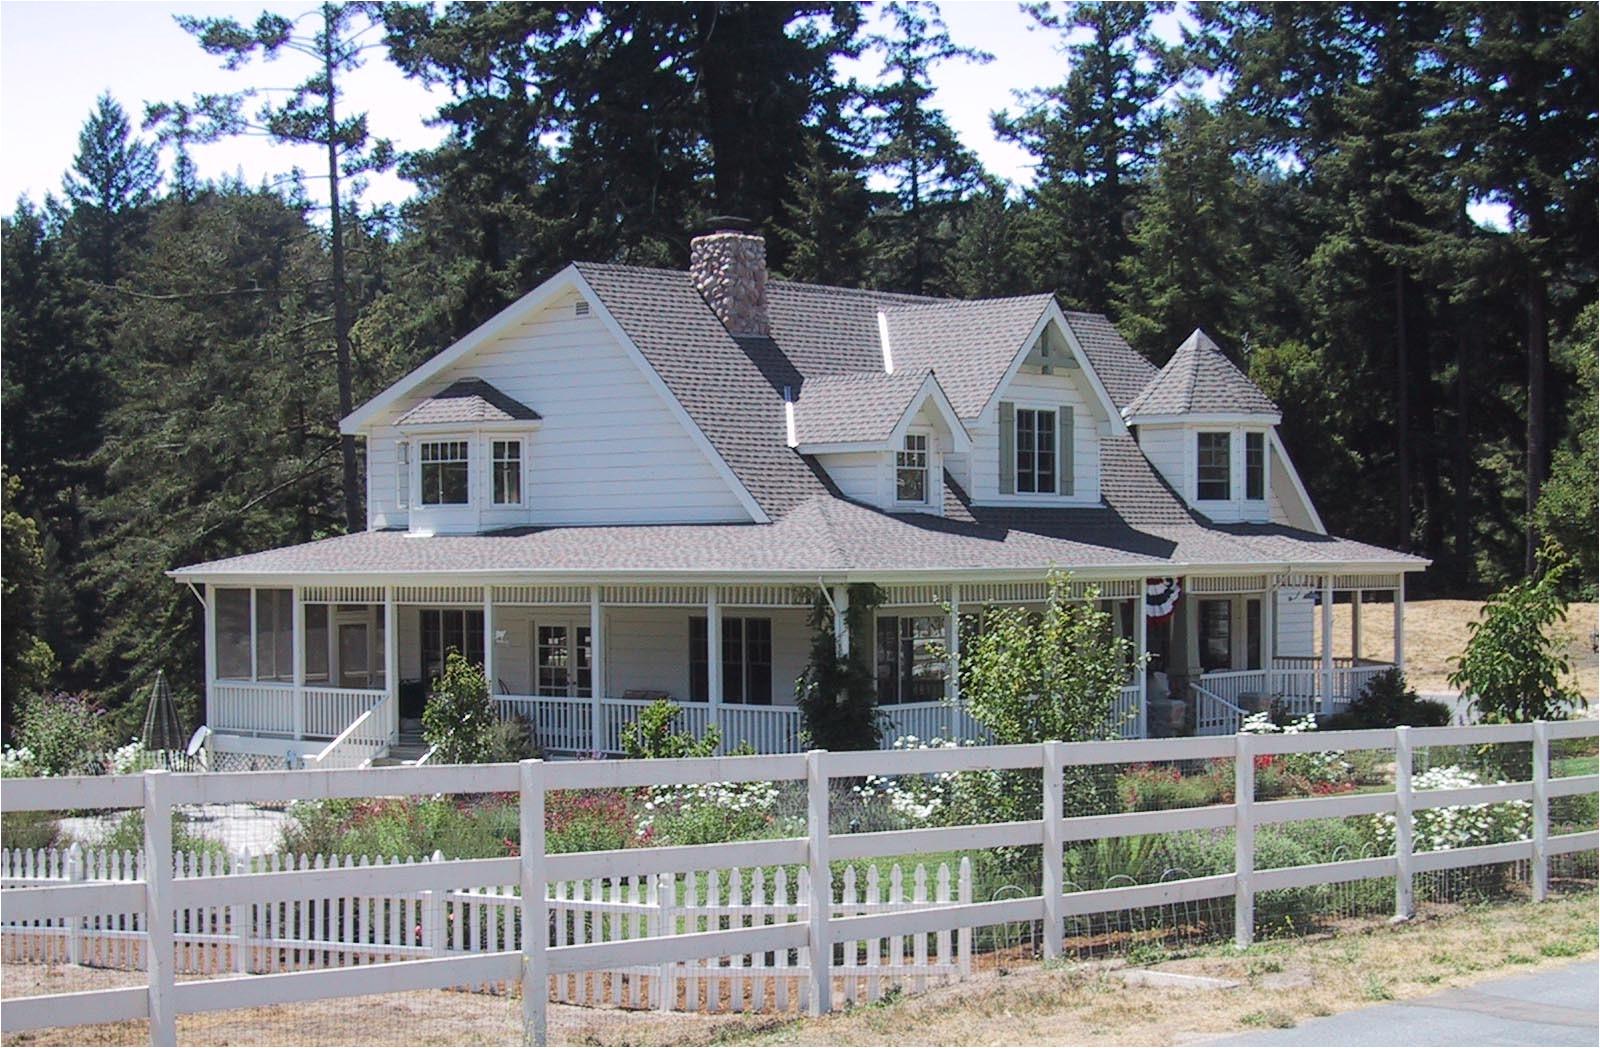 12815 craftsman home plans with wrap around porch